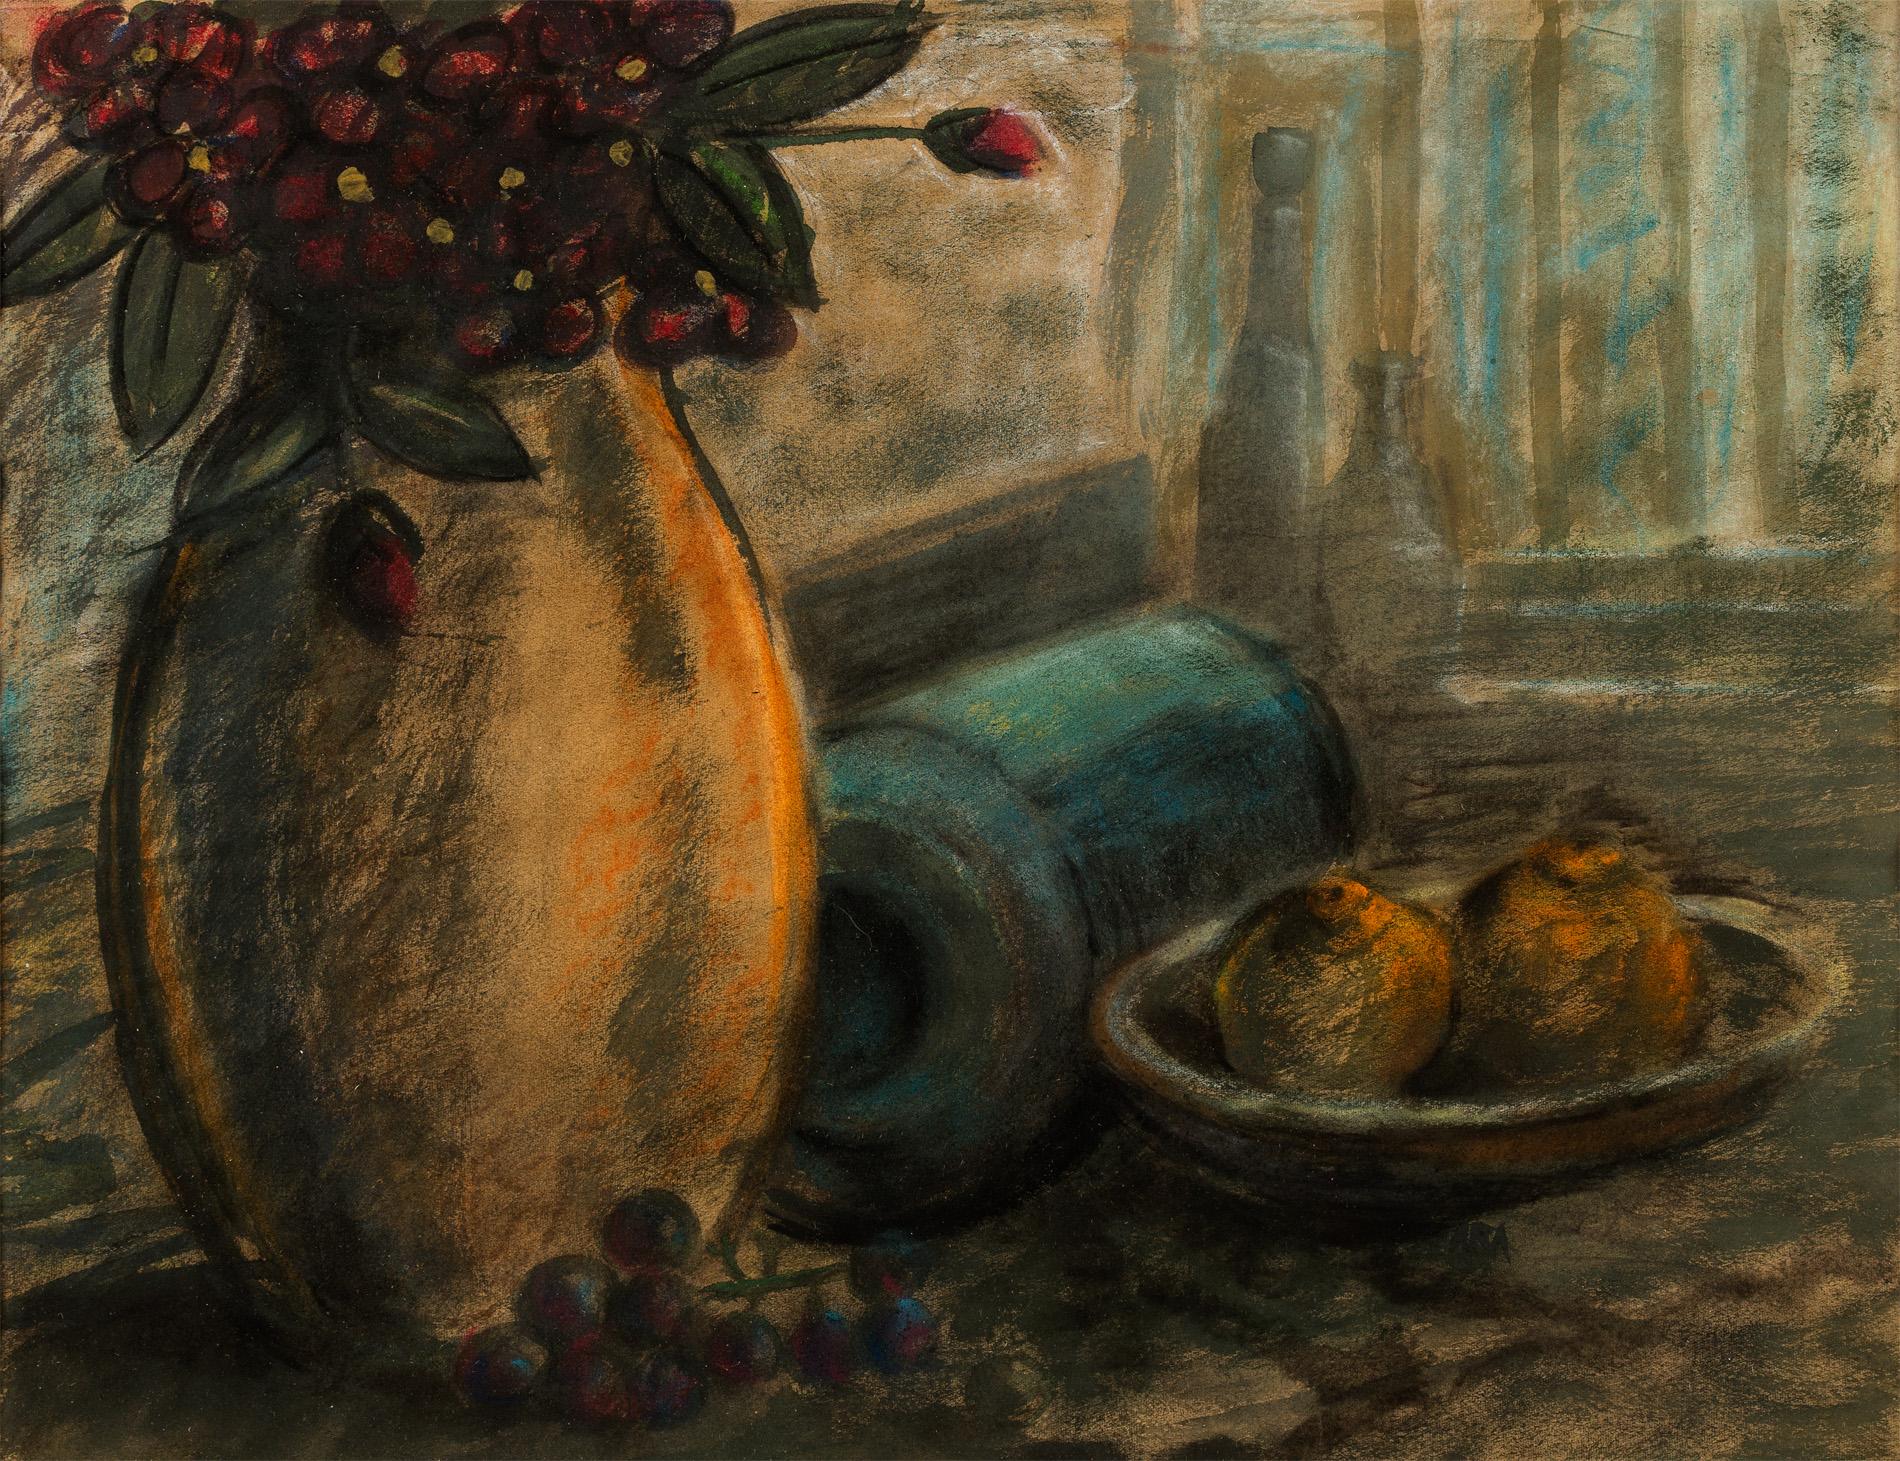 K. H. Ara-Untitled-